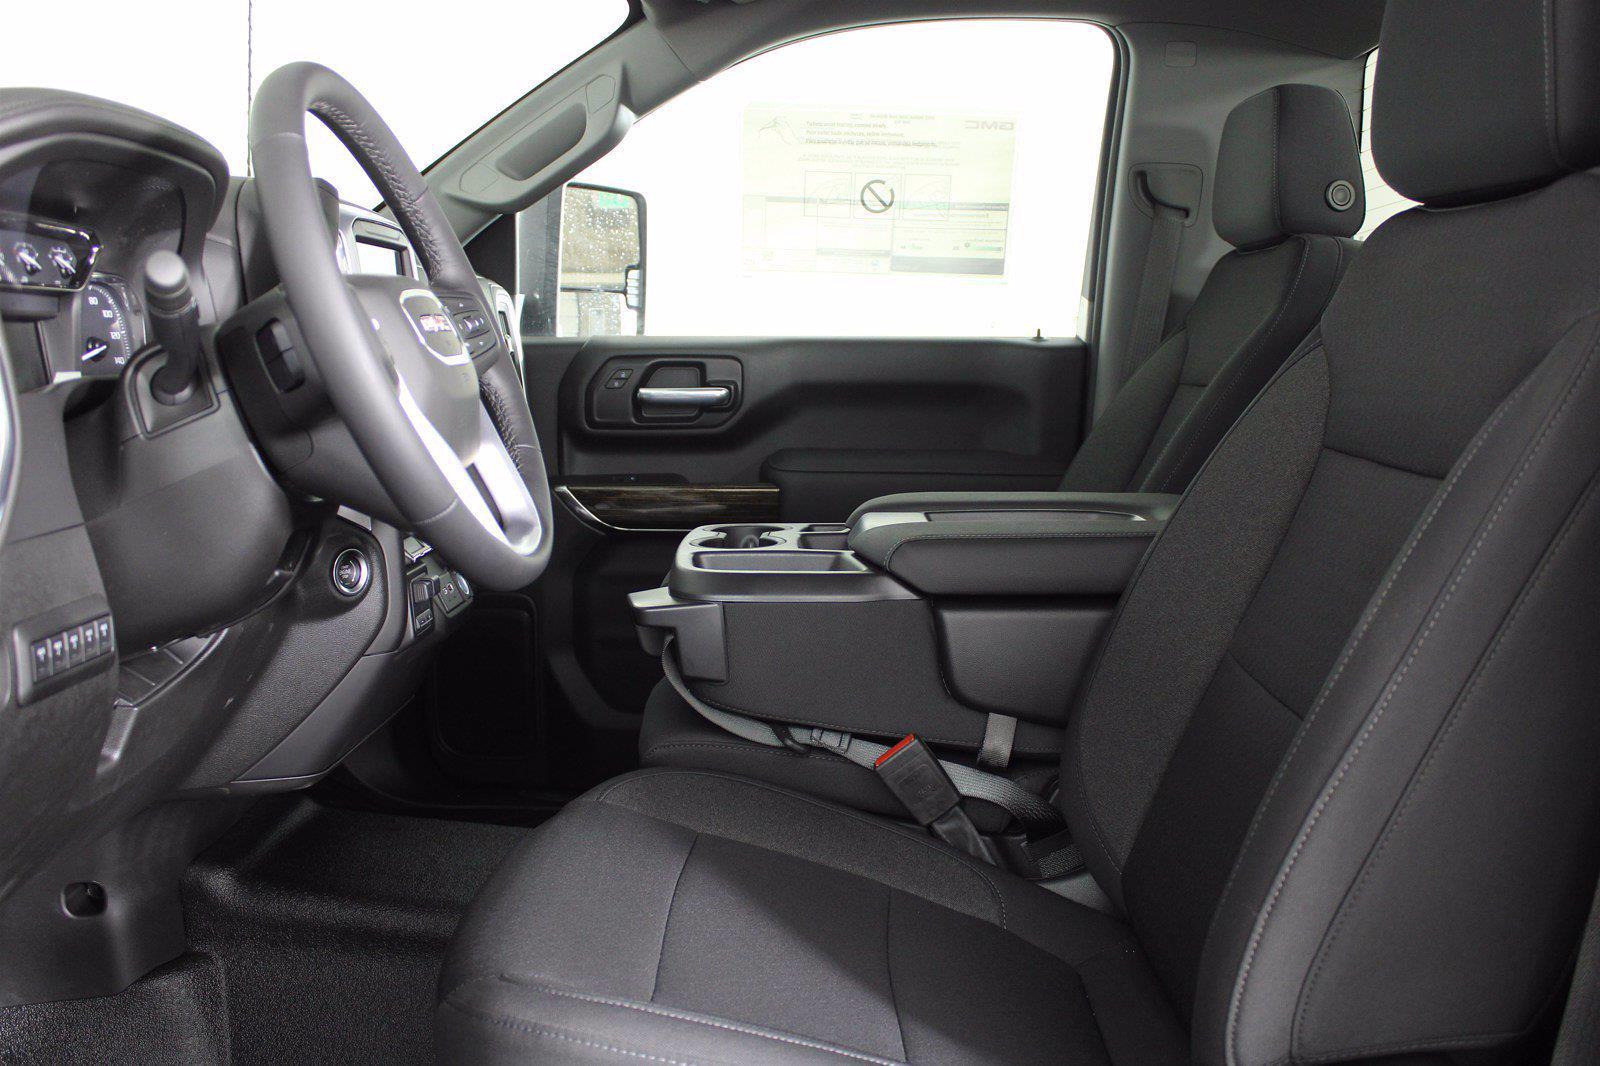 2022 Sierra 2500 Regular Cab 4x4,  Pickup #D420038 - photo 15